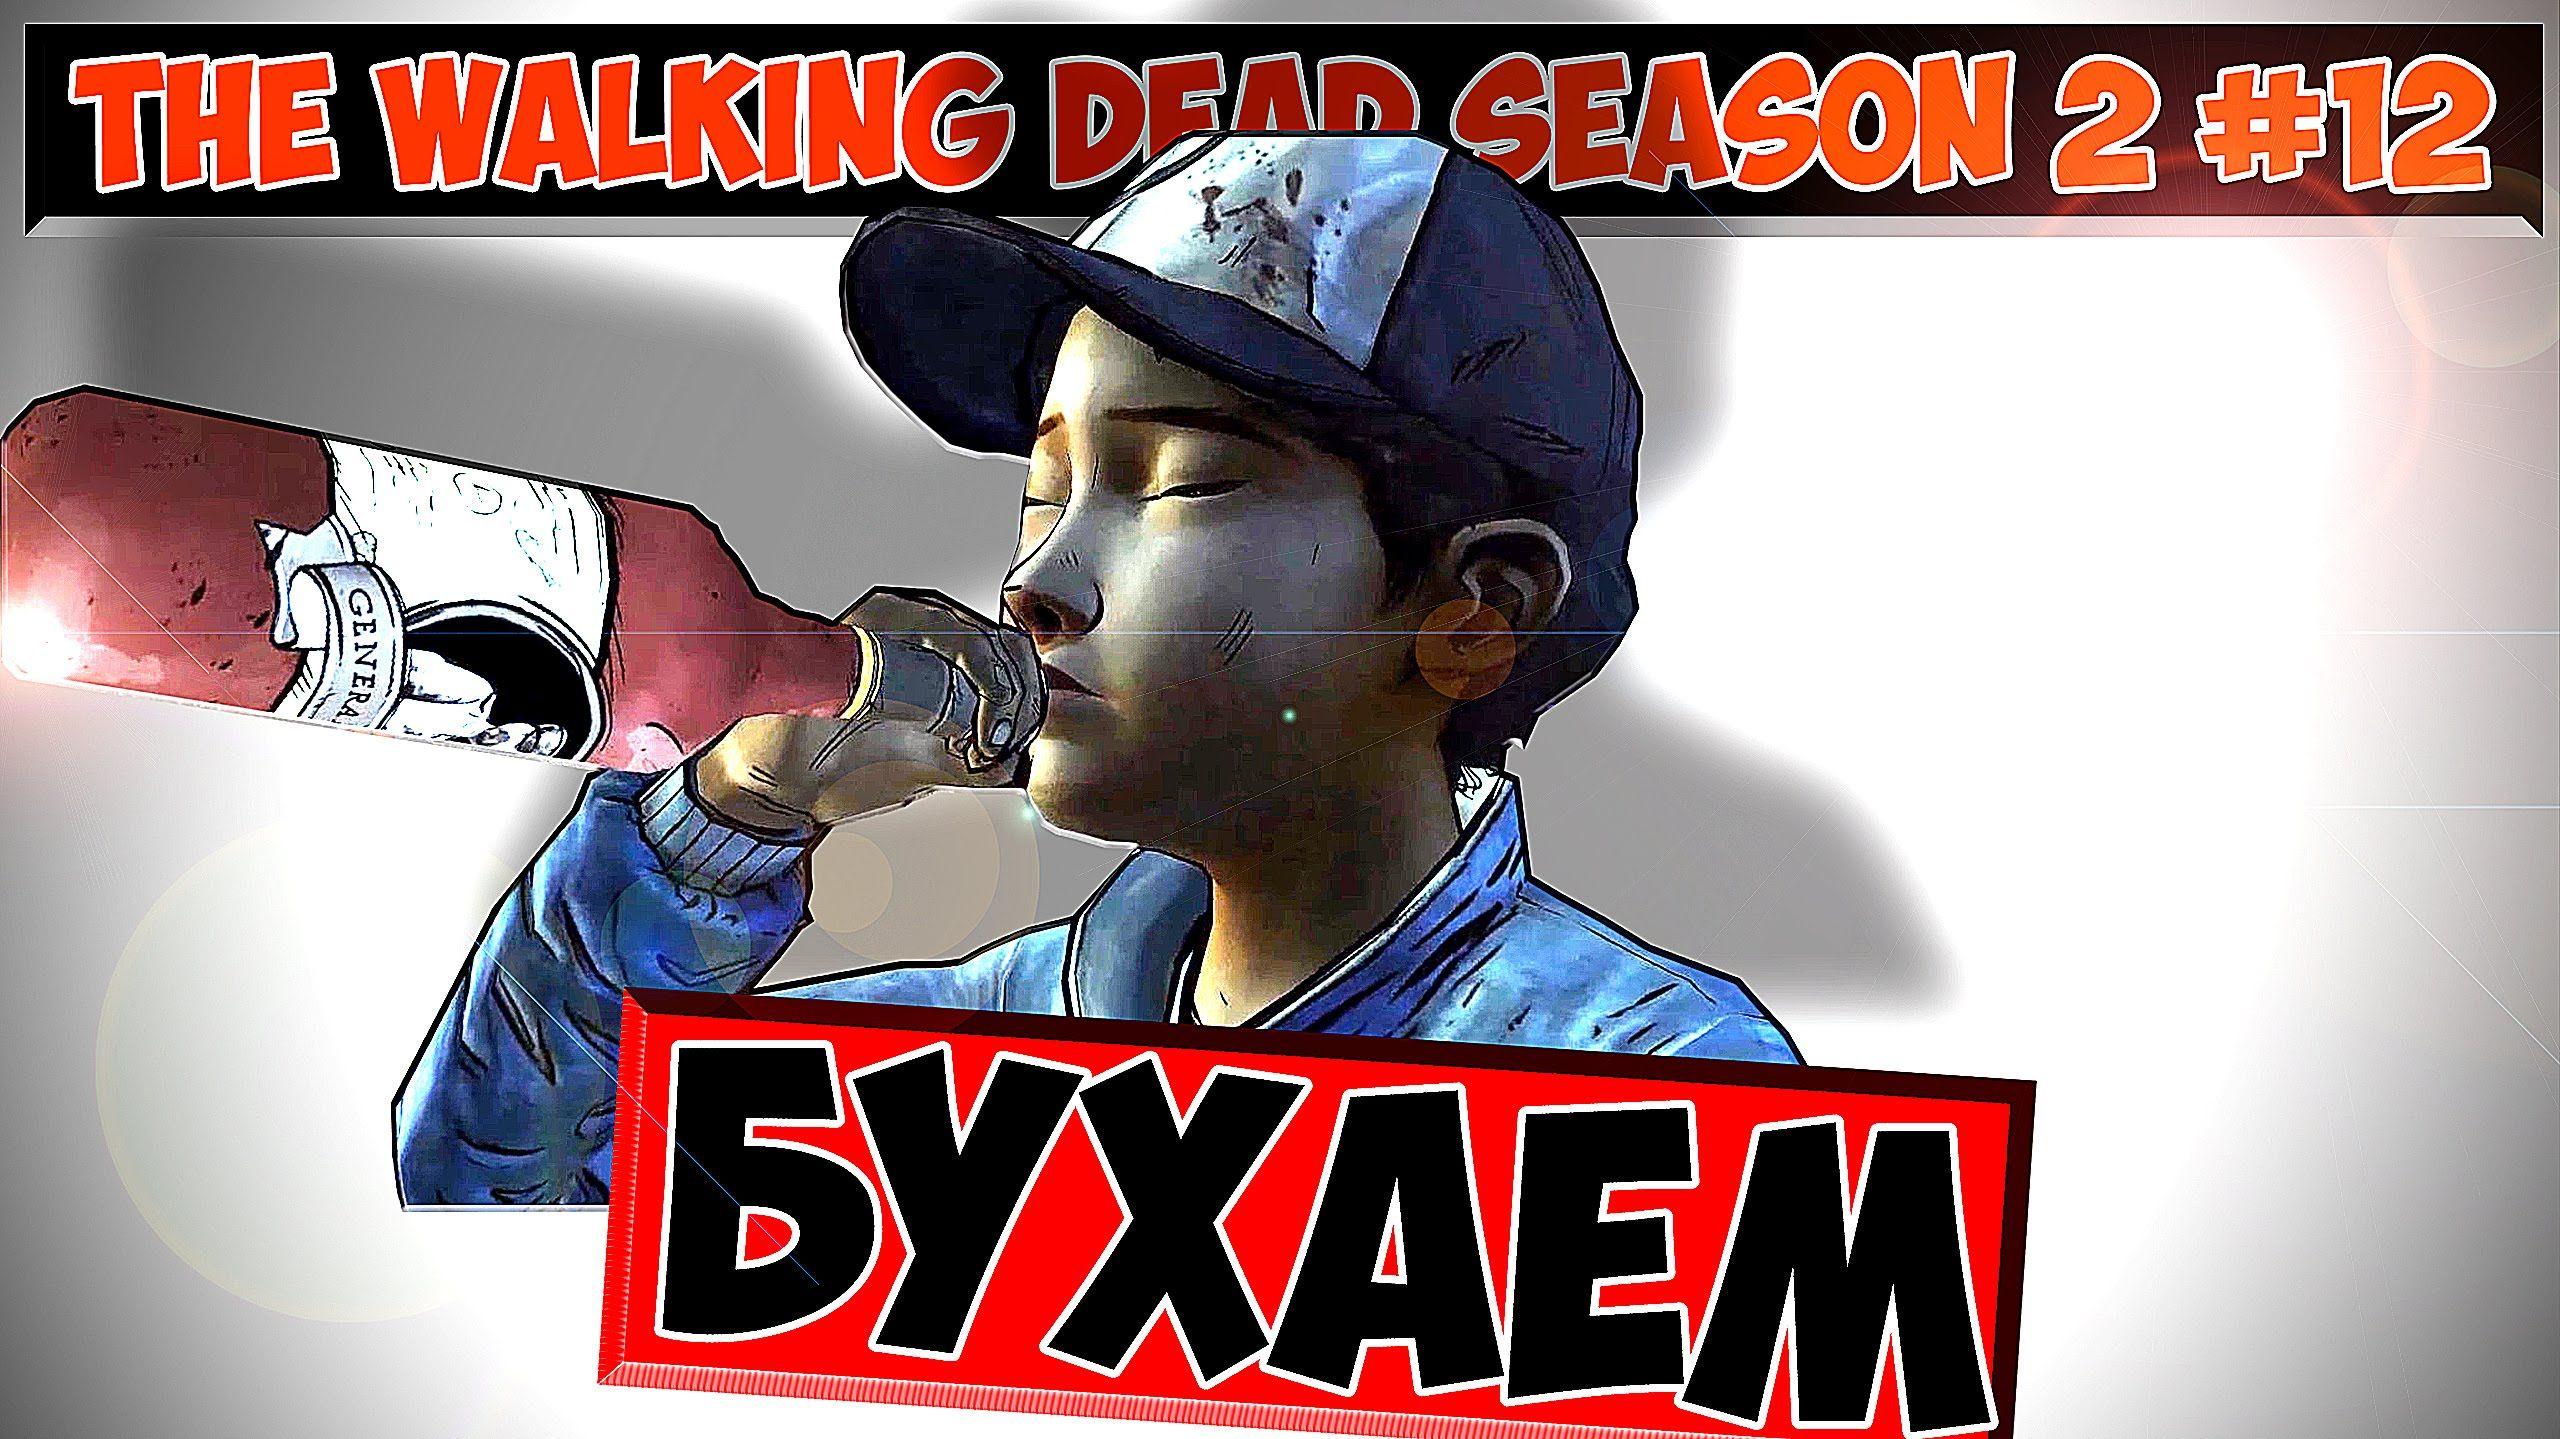 The Walking Dead Season 2 #12 (Бухаем)